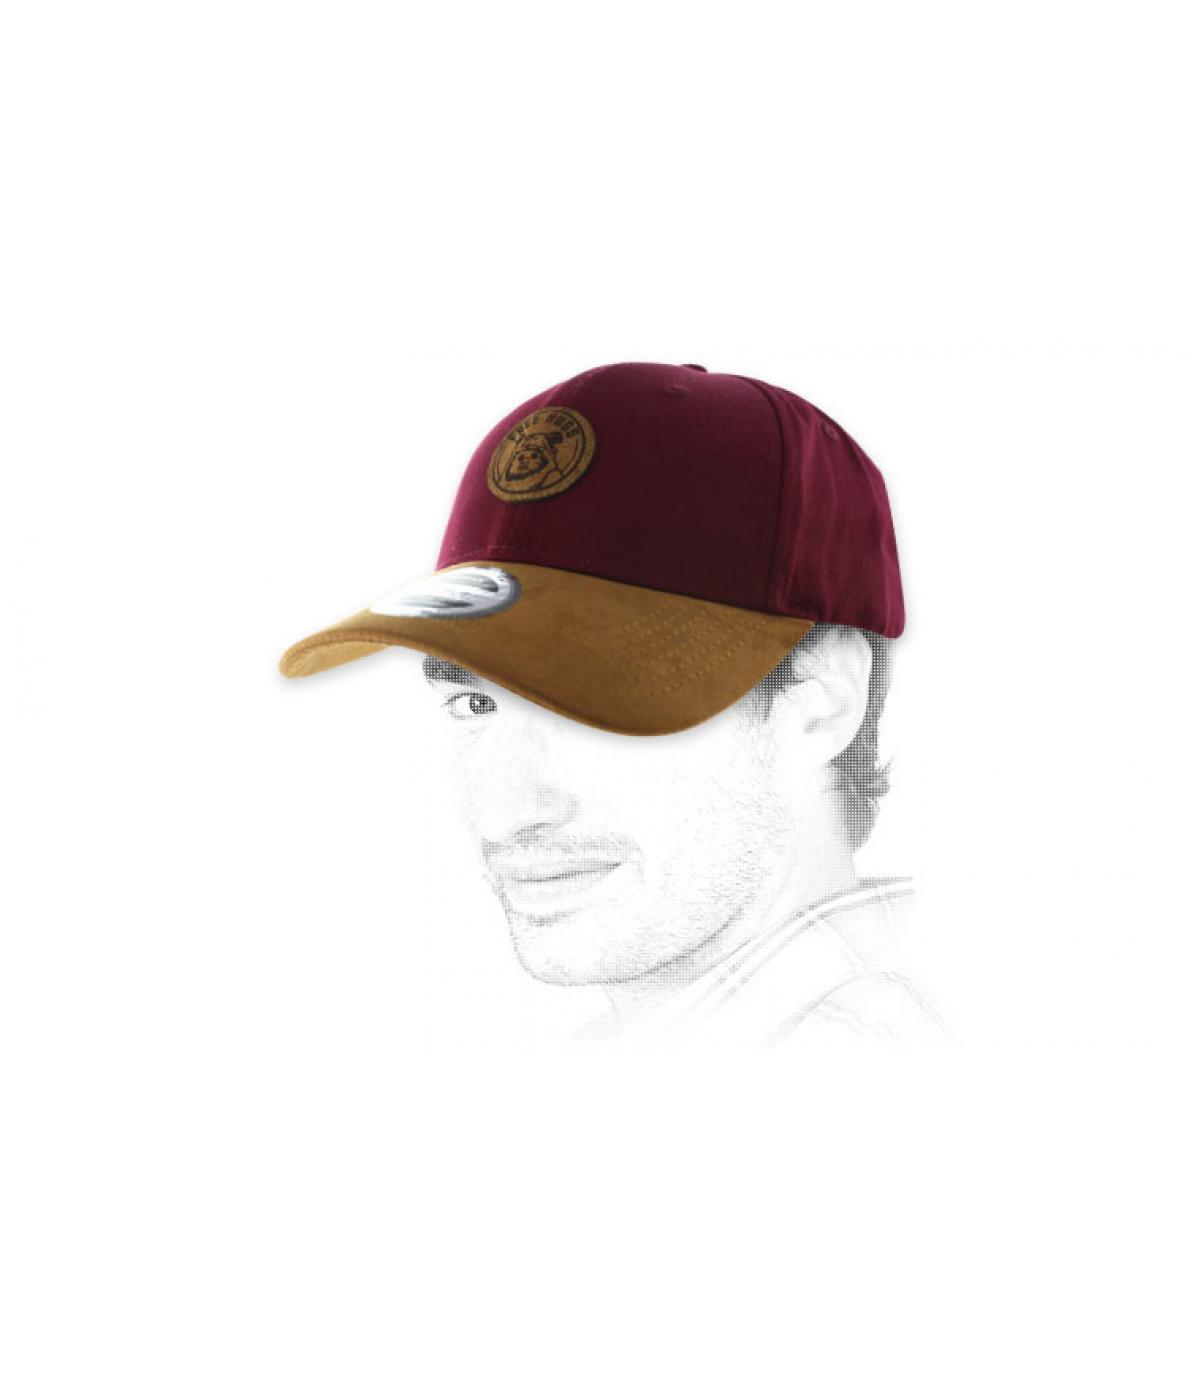 Gratis Bourgondië Hugs cap